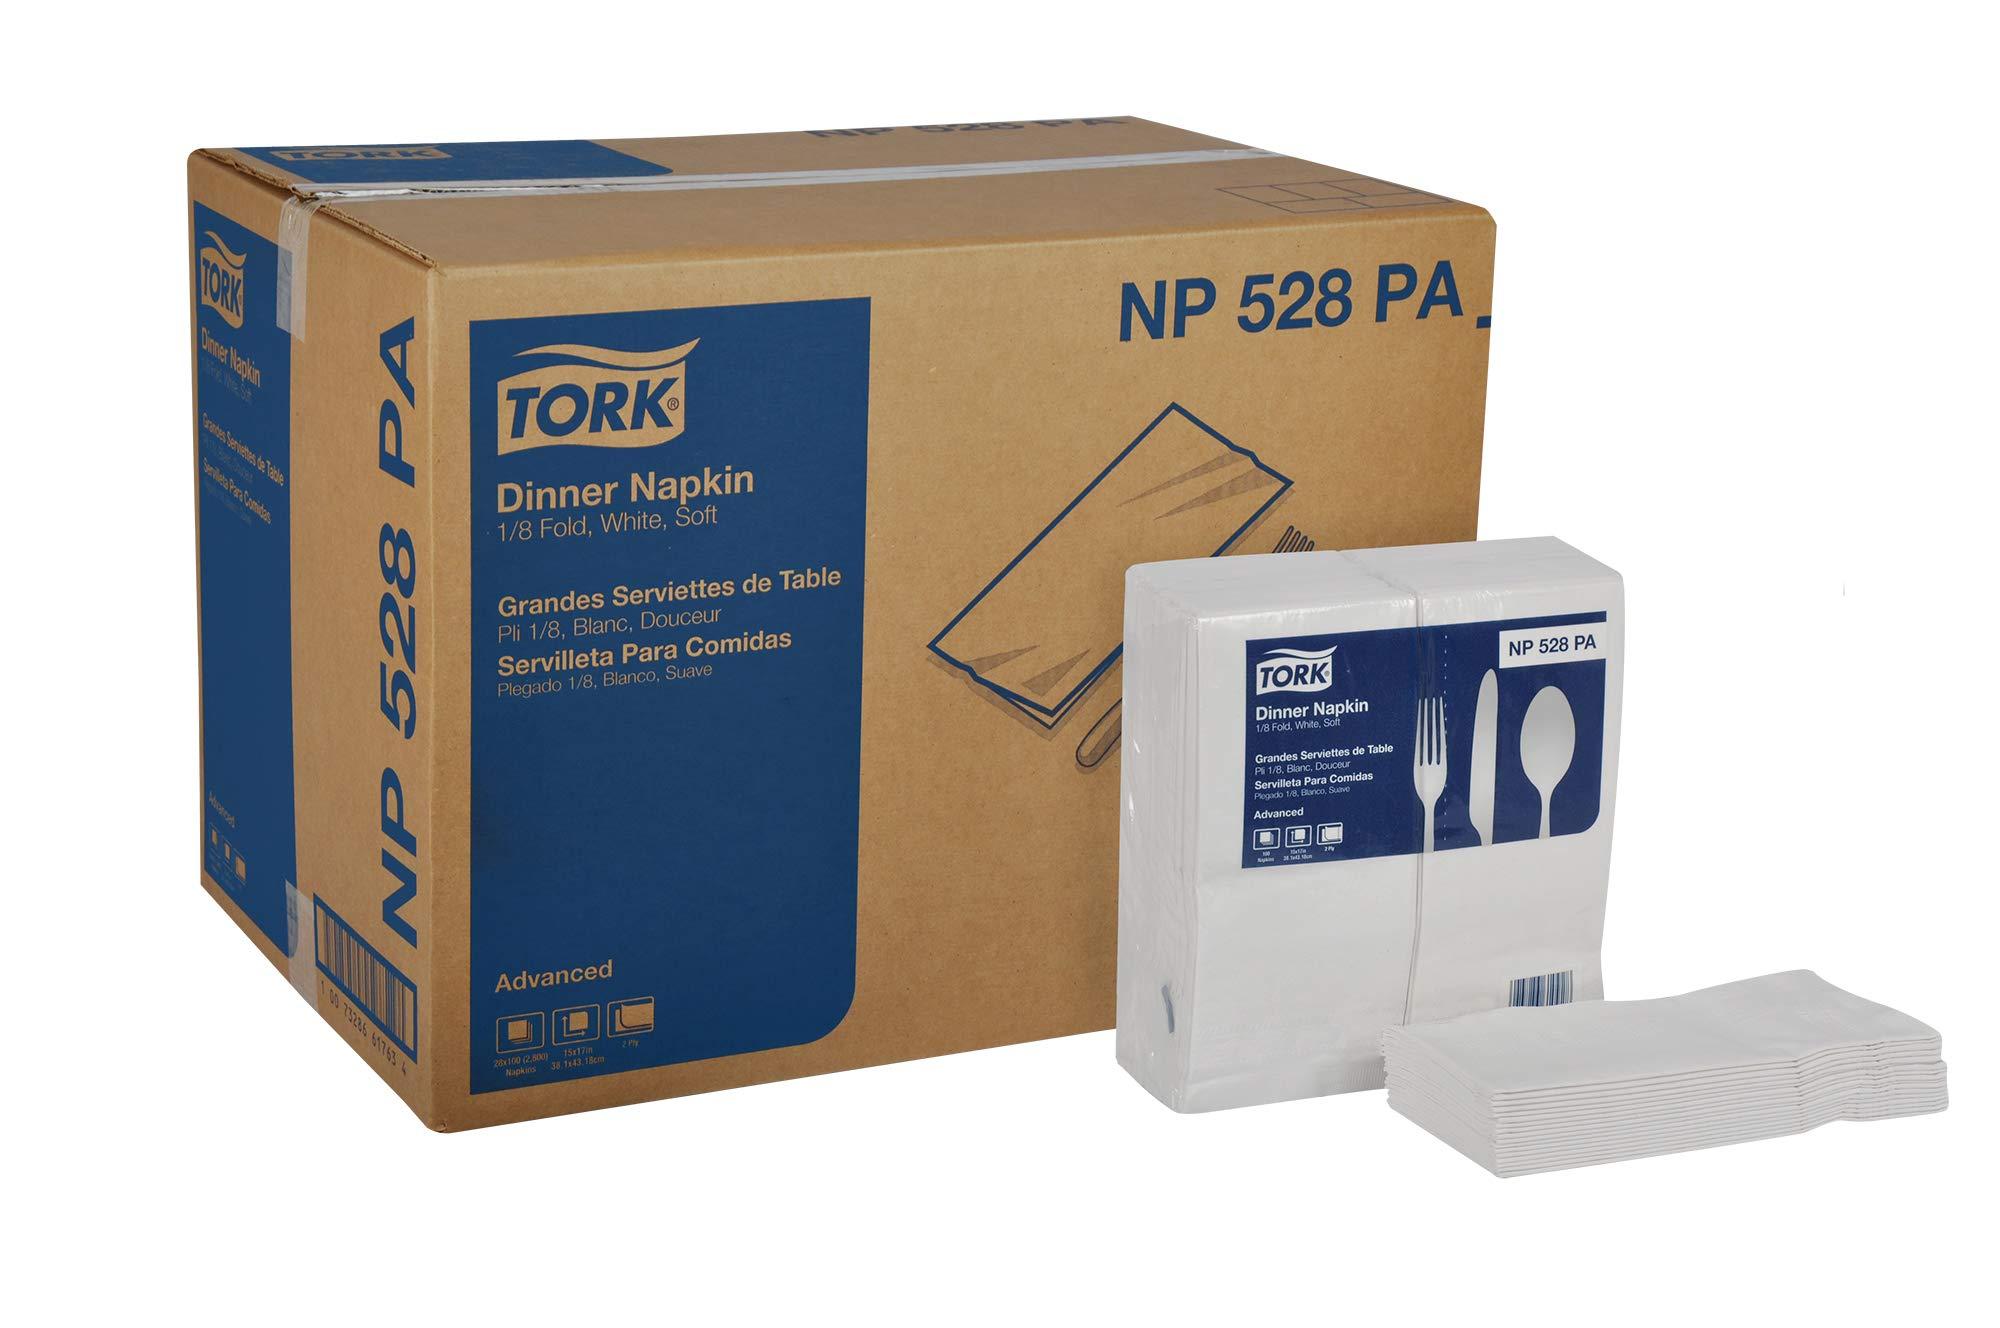 Tork Advanced NP528PA Soft Dinner Napkin, 2-Ply, 1/8 Fold, 15'' Width x 17'' Length, White (Case of 28 Packs, 100 per Pack, 2,800 Napkins) by Tork